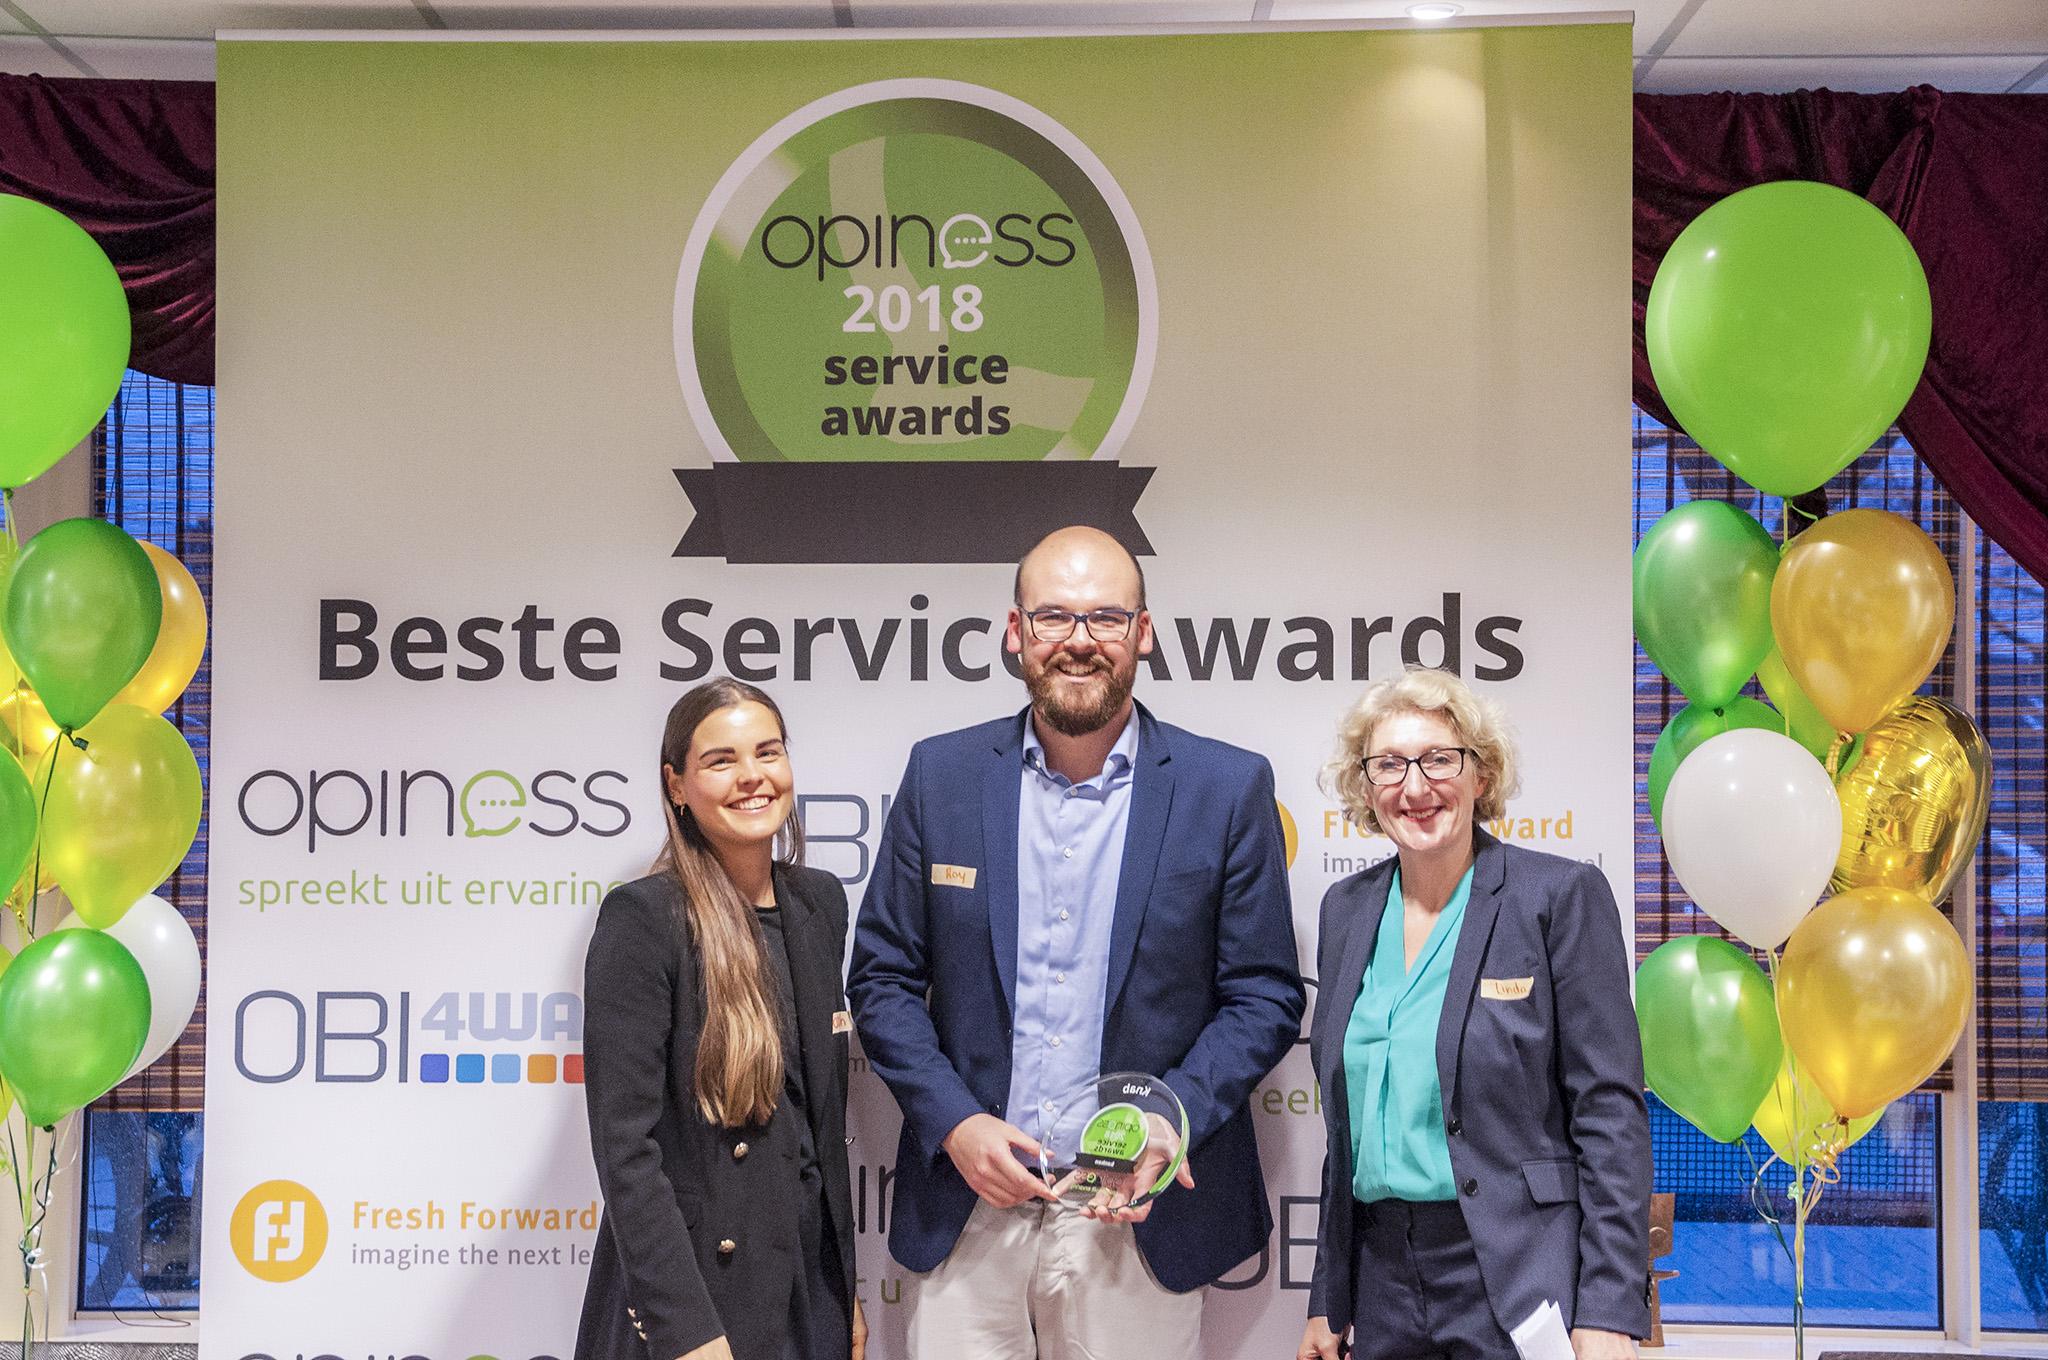 Winnaar Knab Opiness Award